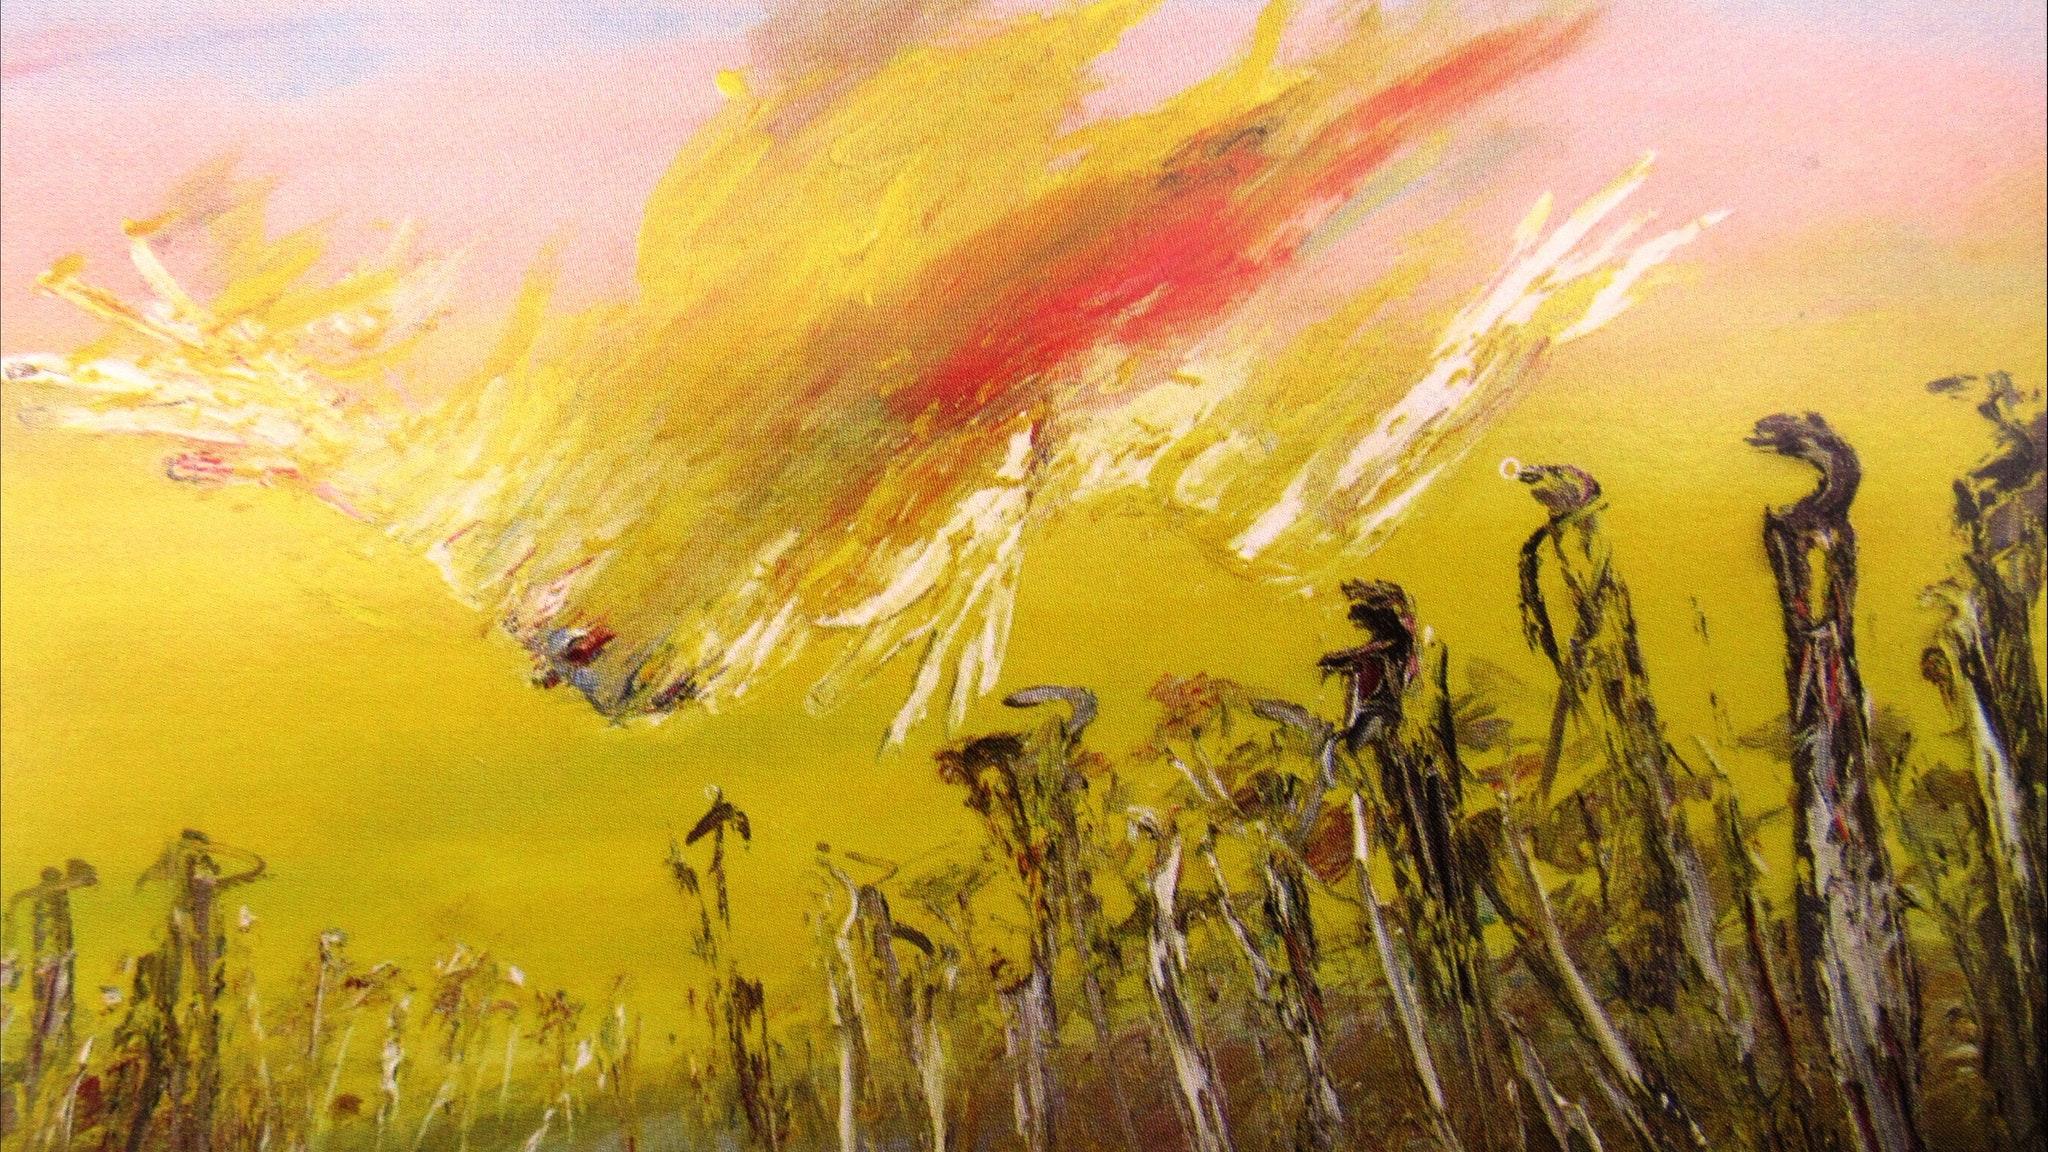 Arthur Boyd: Nebuchadnezzar on fire falling over a waterfall (1966-1968)